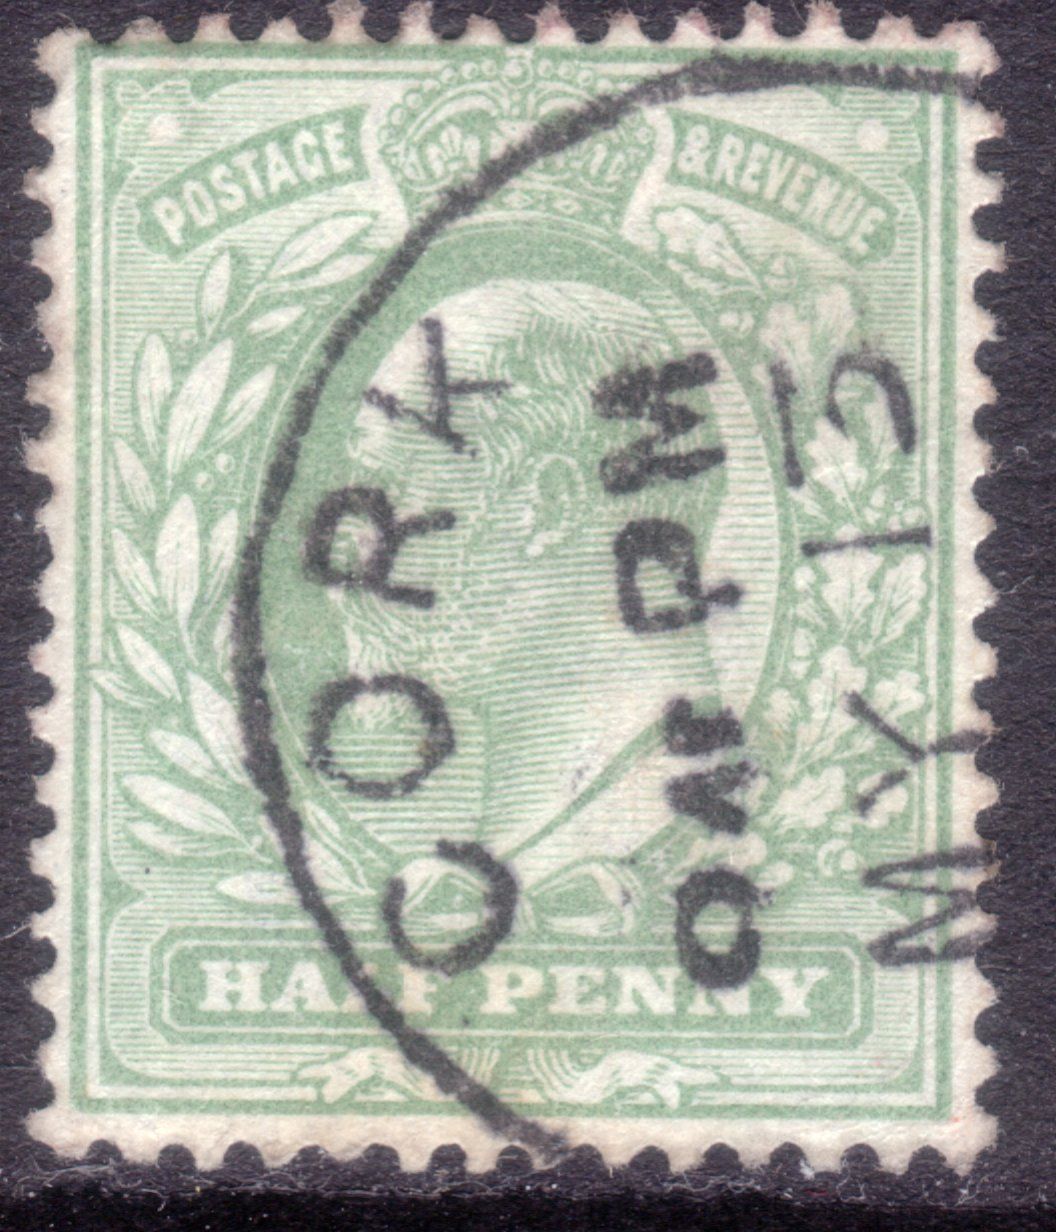 1904 ½d Pale Yellowish Green Neat Irish Skeleton Cancel